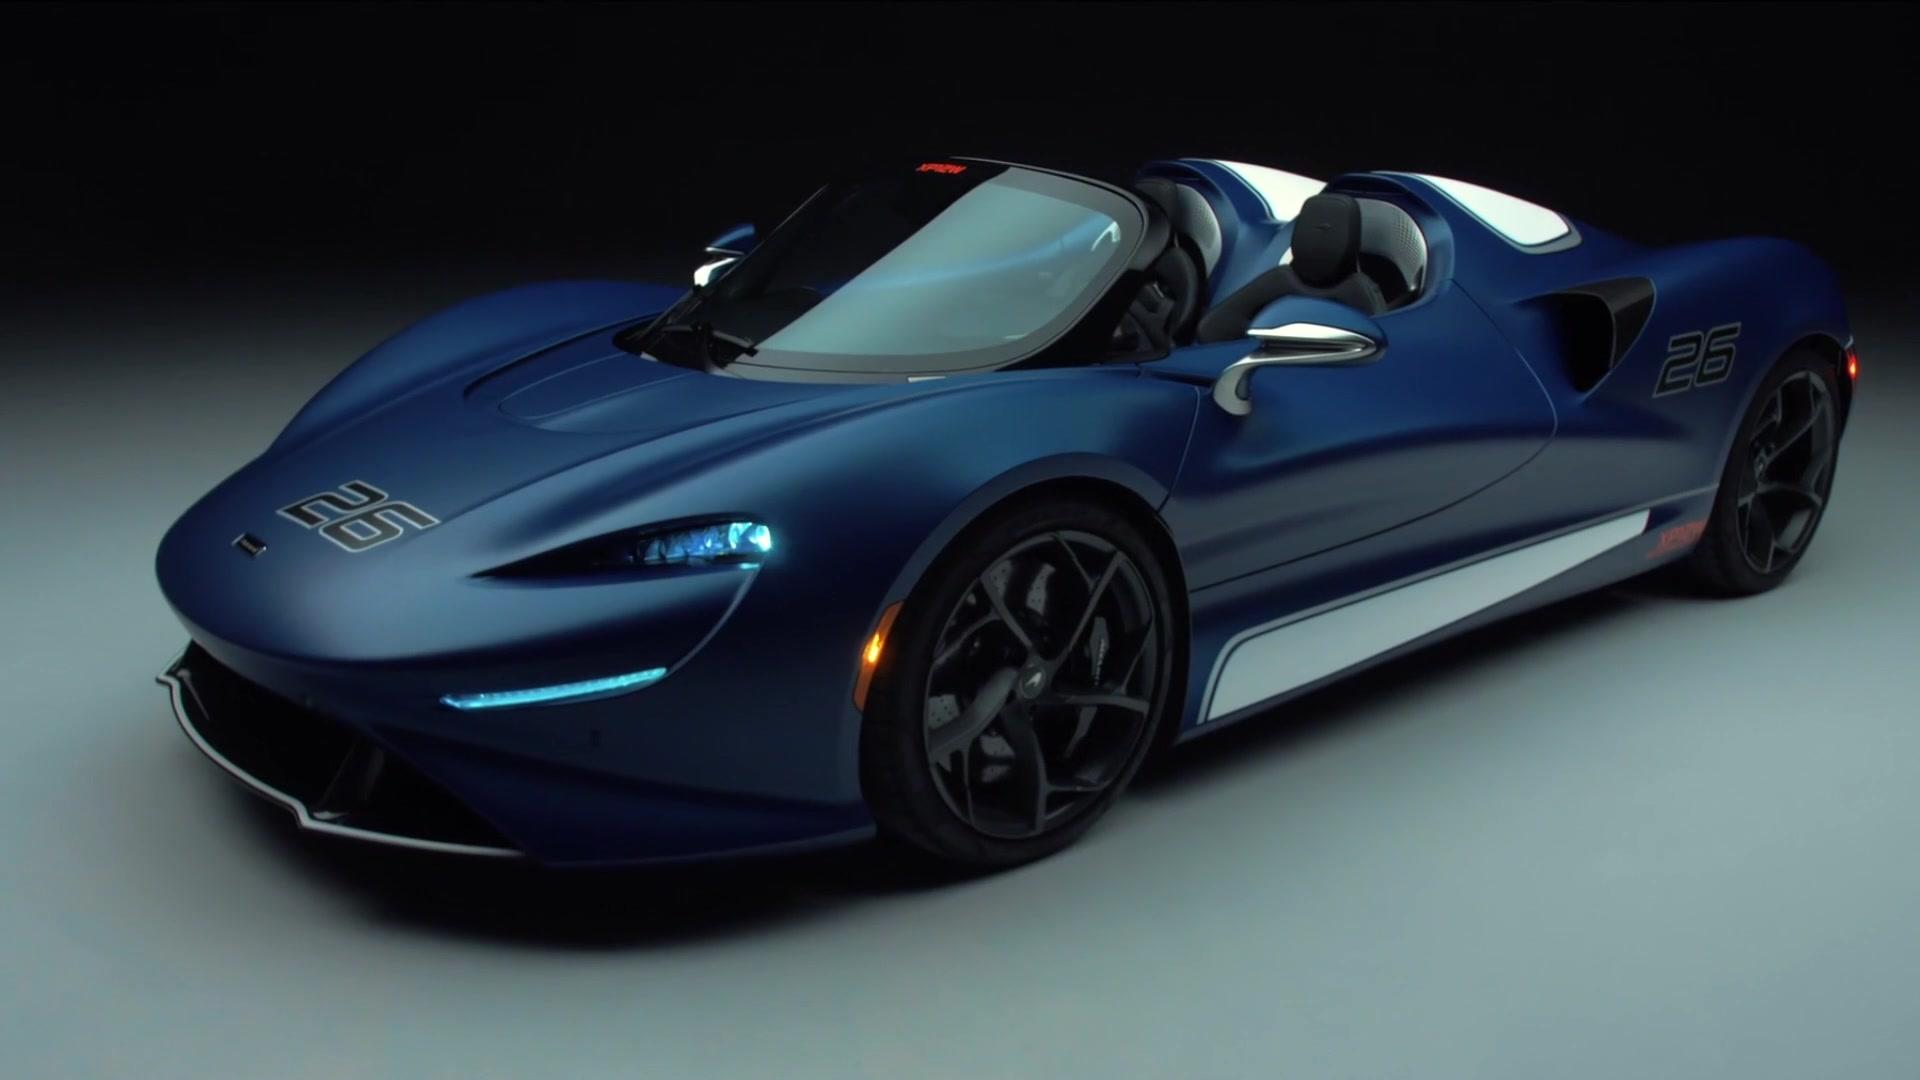 Das ultimative Open-Top-Roadster-Erlebnis: Windschutzscheiben-Version des ultra-exklusiven McLaren Elva geht in Produktion